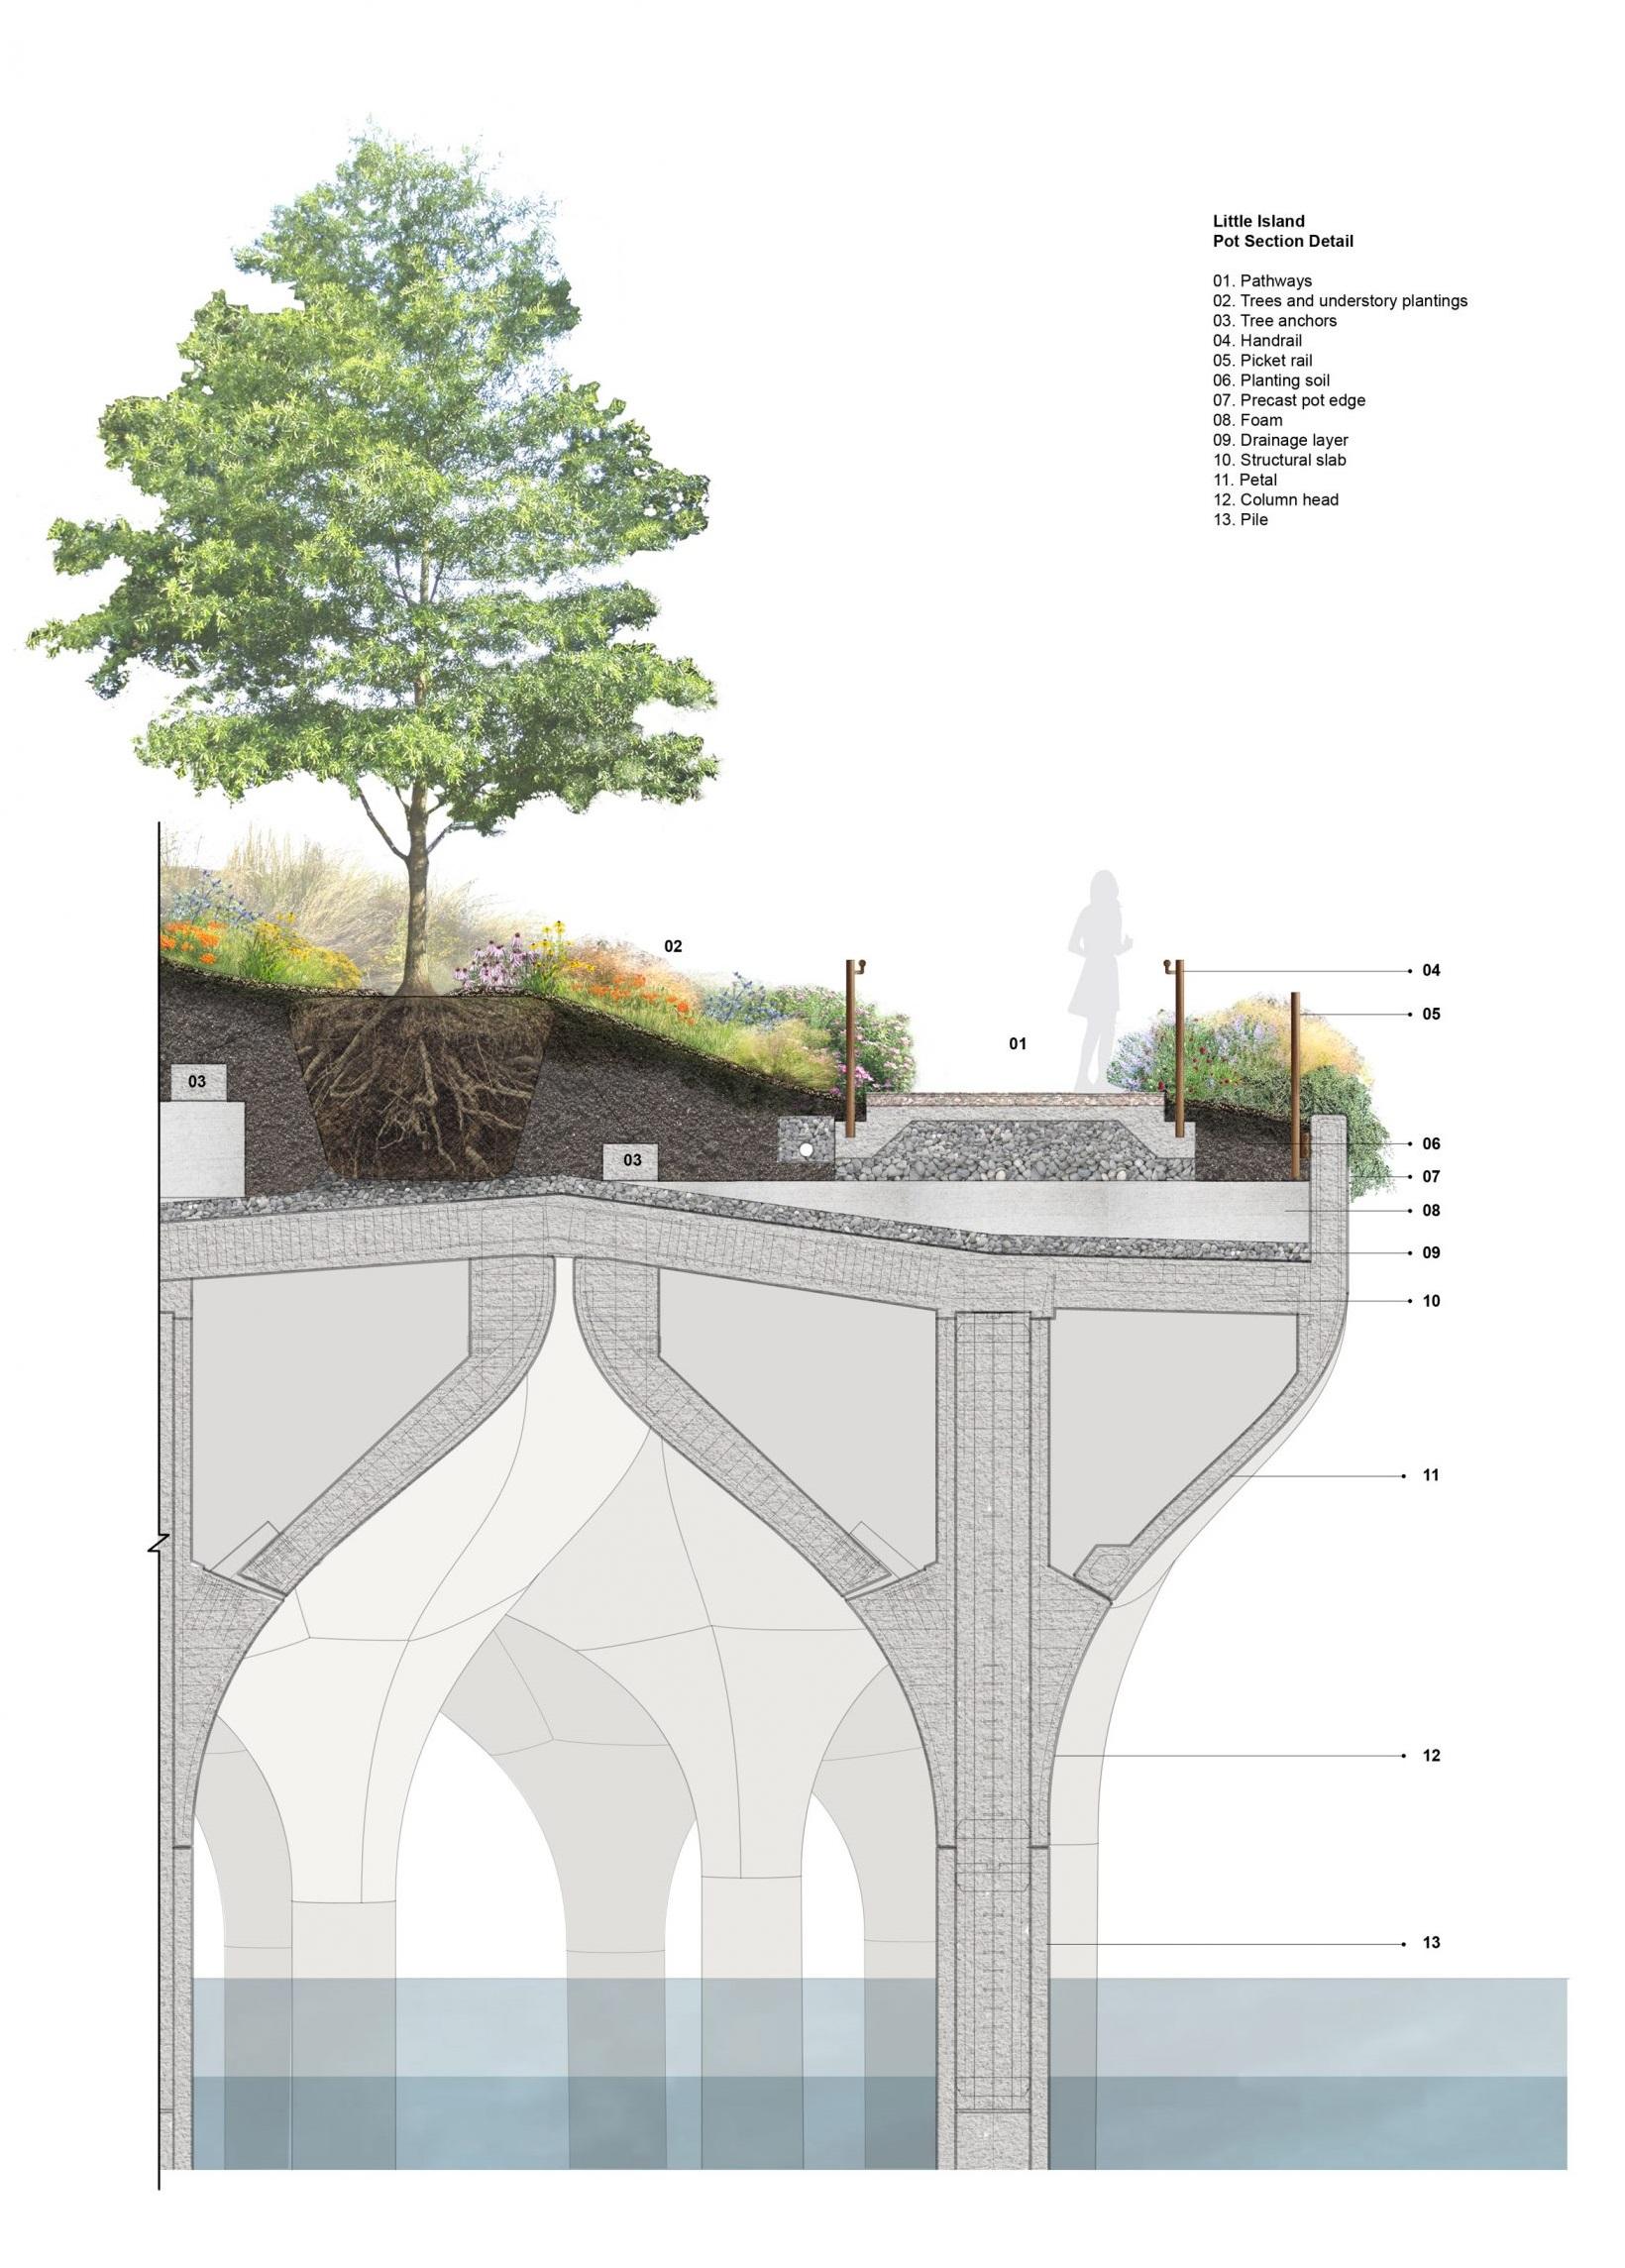 LITTLE ISLAND PULAU KECIL BERKONTUR DI SISI BARAT MANHATTAN NEW YORK DSGNTALK ARCHITECTURE USA